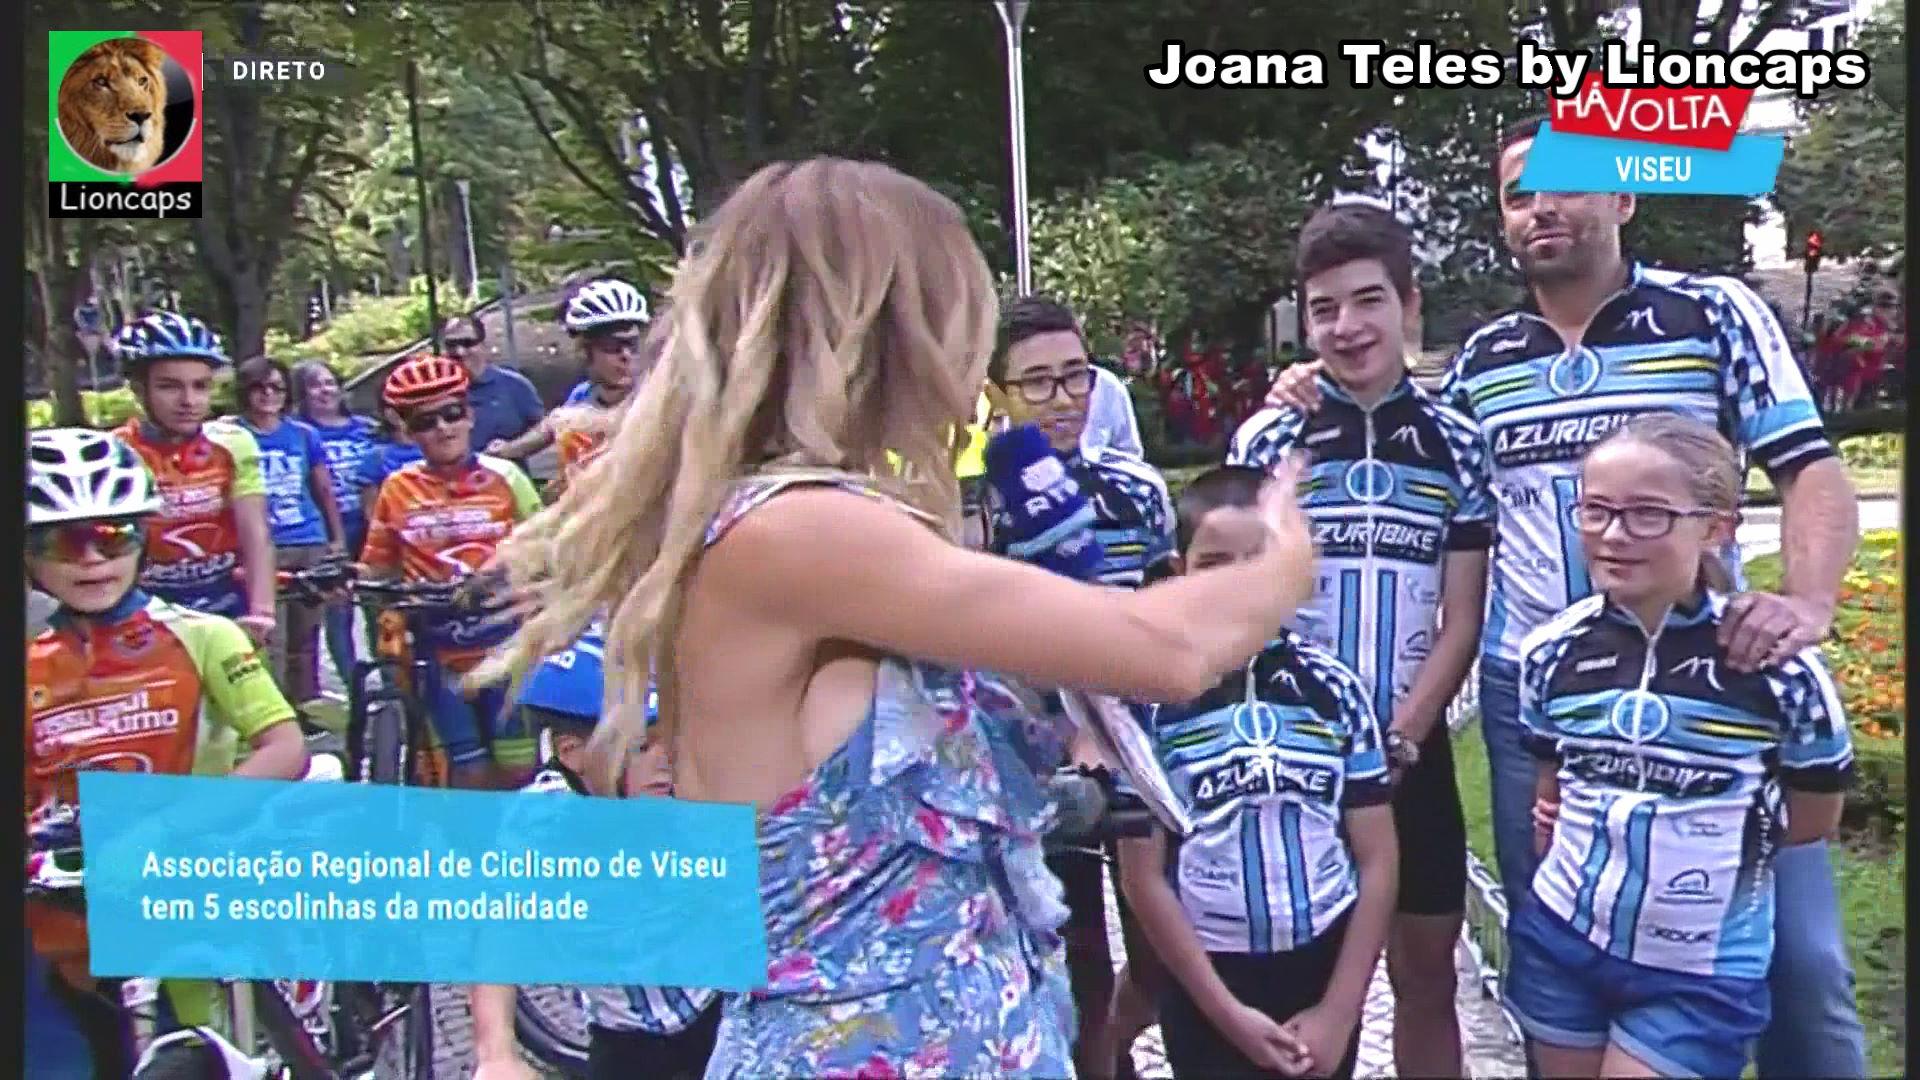 976684317_joana_teles_vs200125_11615_122_66lo.JPG